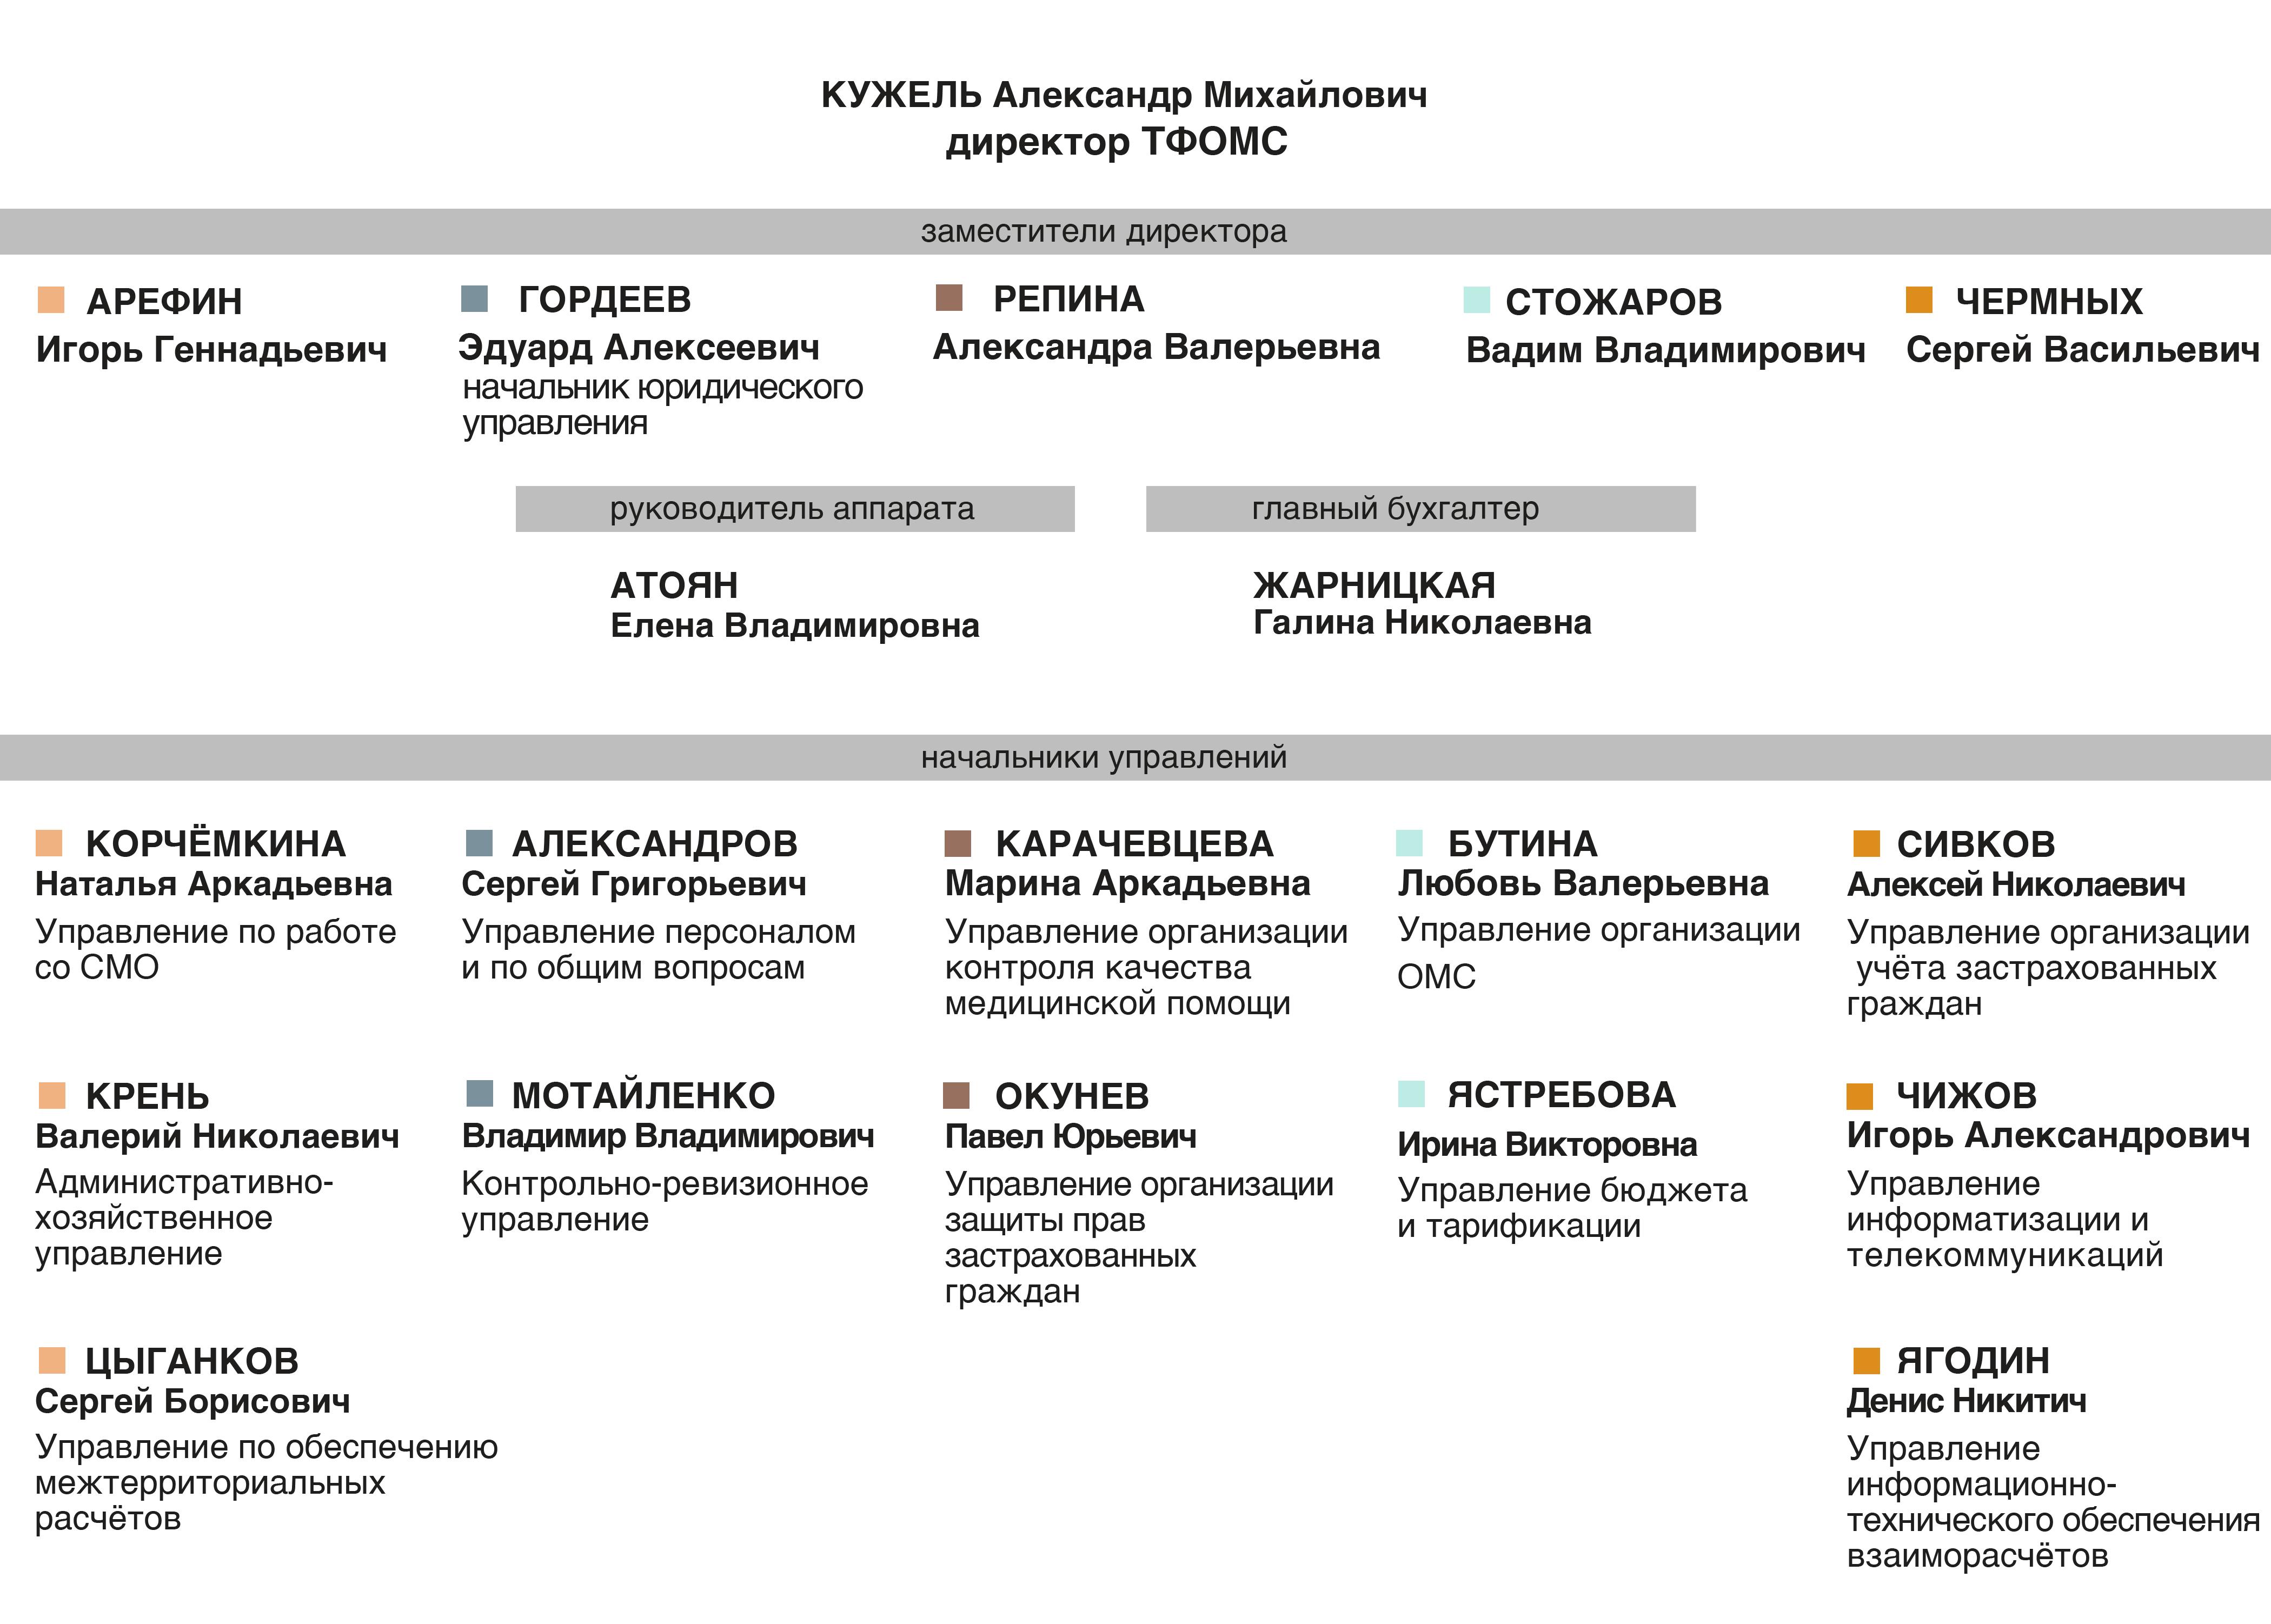 https://spboms.ru/sites/default/files/diagram2.jpg